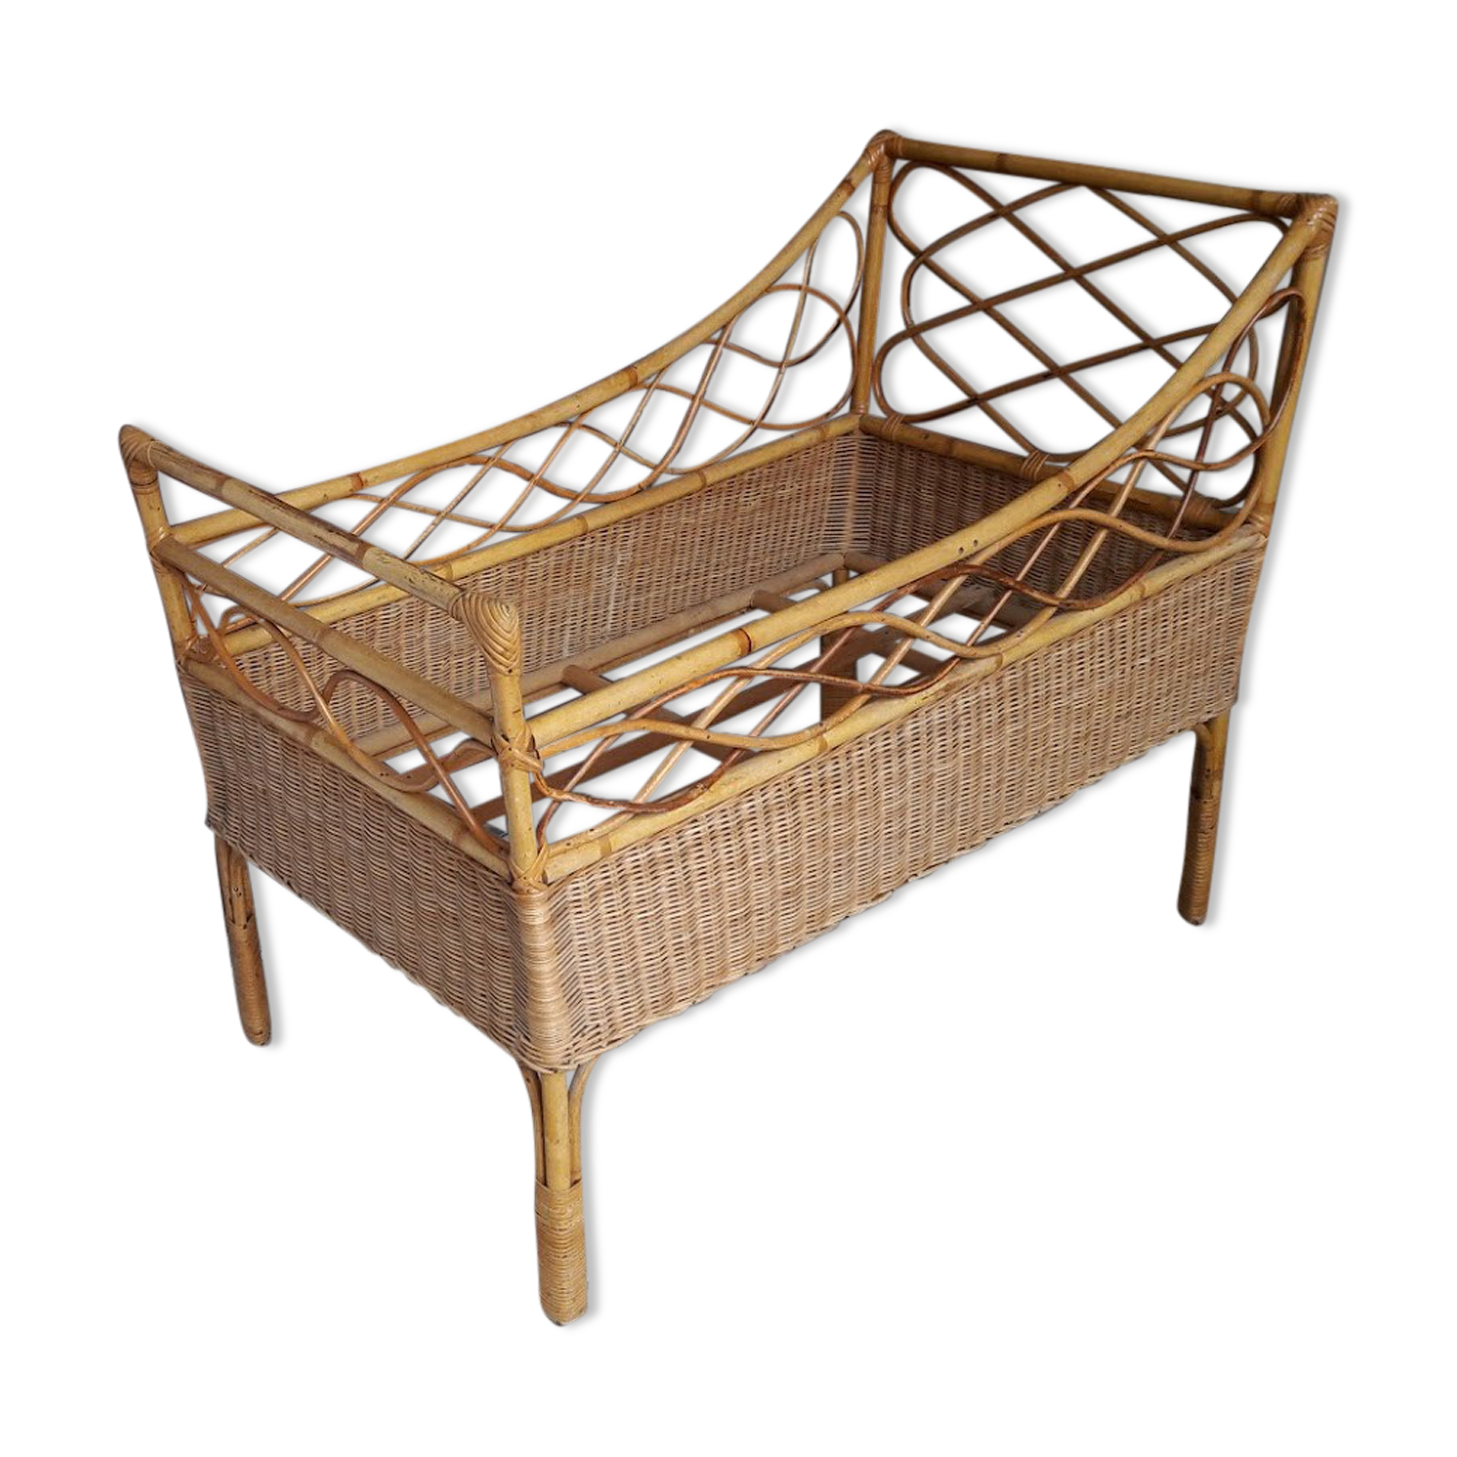 lit en osier ikea great interesting simple tete de lit a. Black Bedroom Furniture Sets. Home Design Ideas